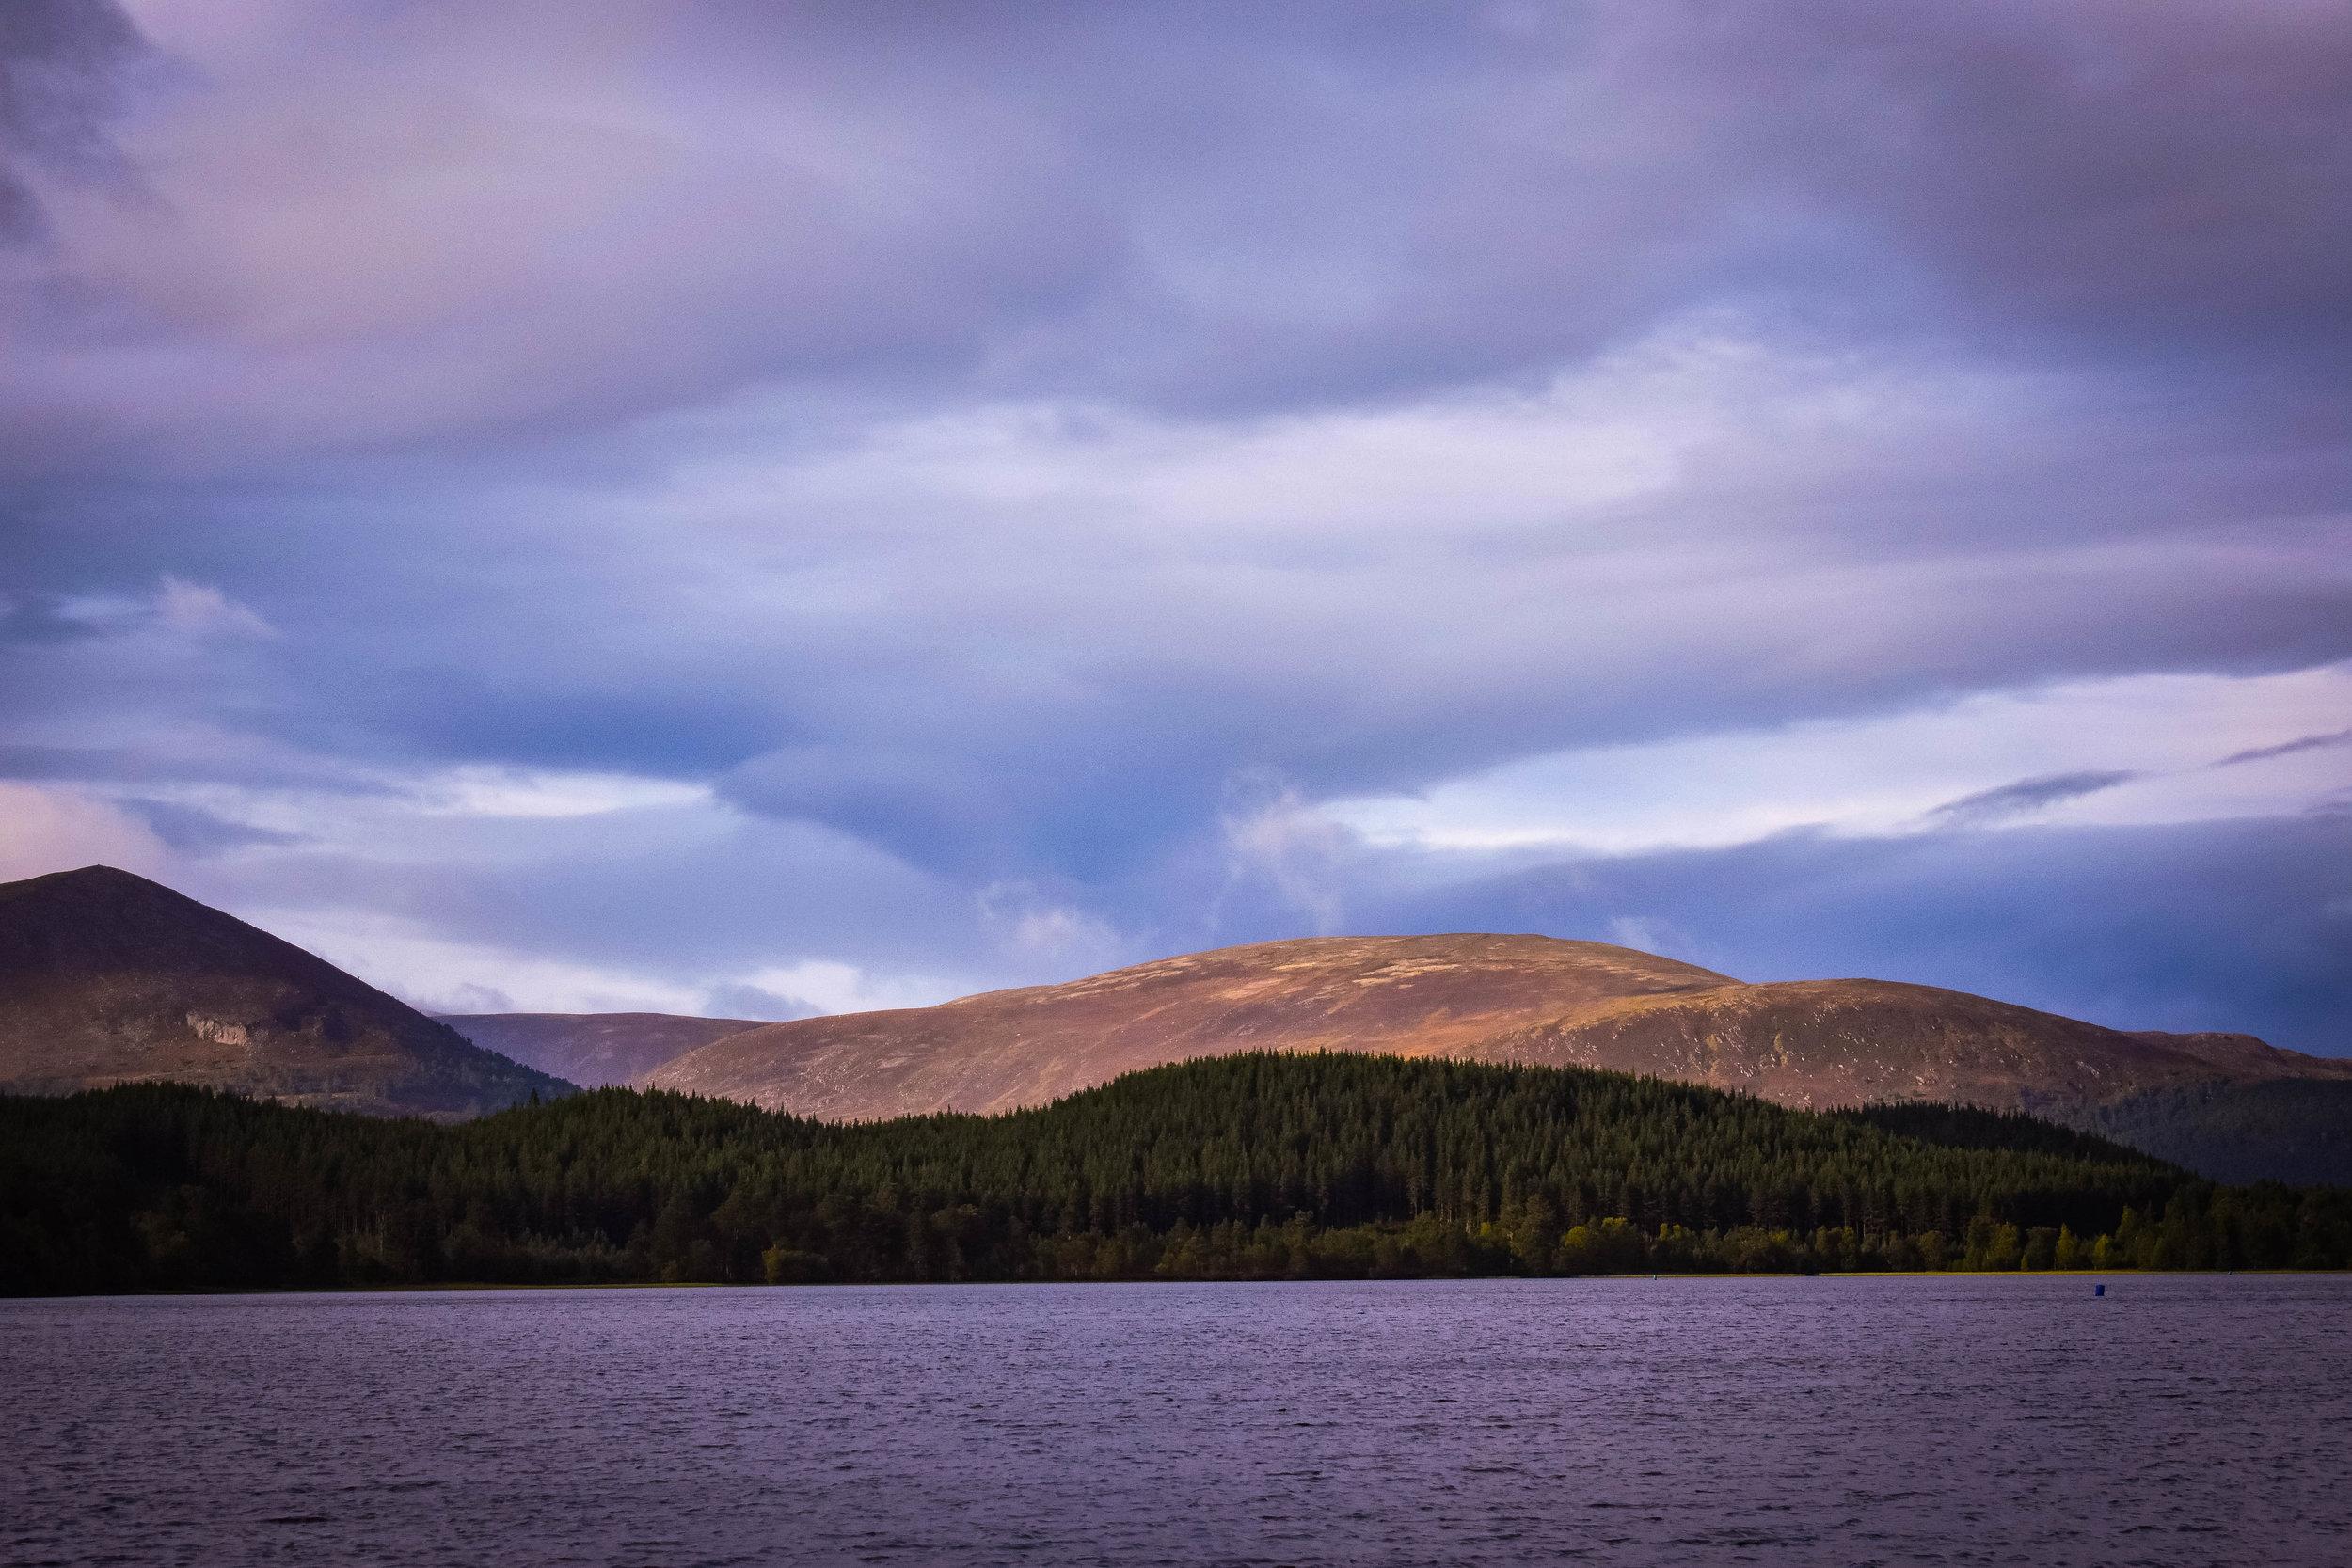 Loch Morlich, Cairngorms National Park, Scotland